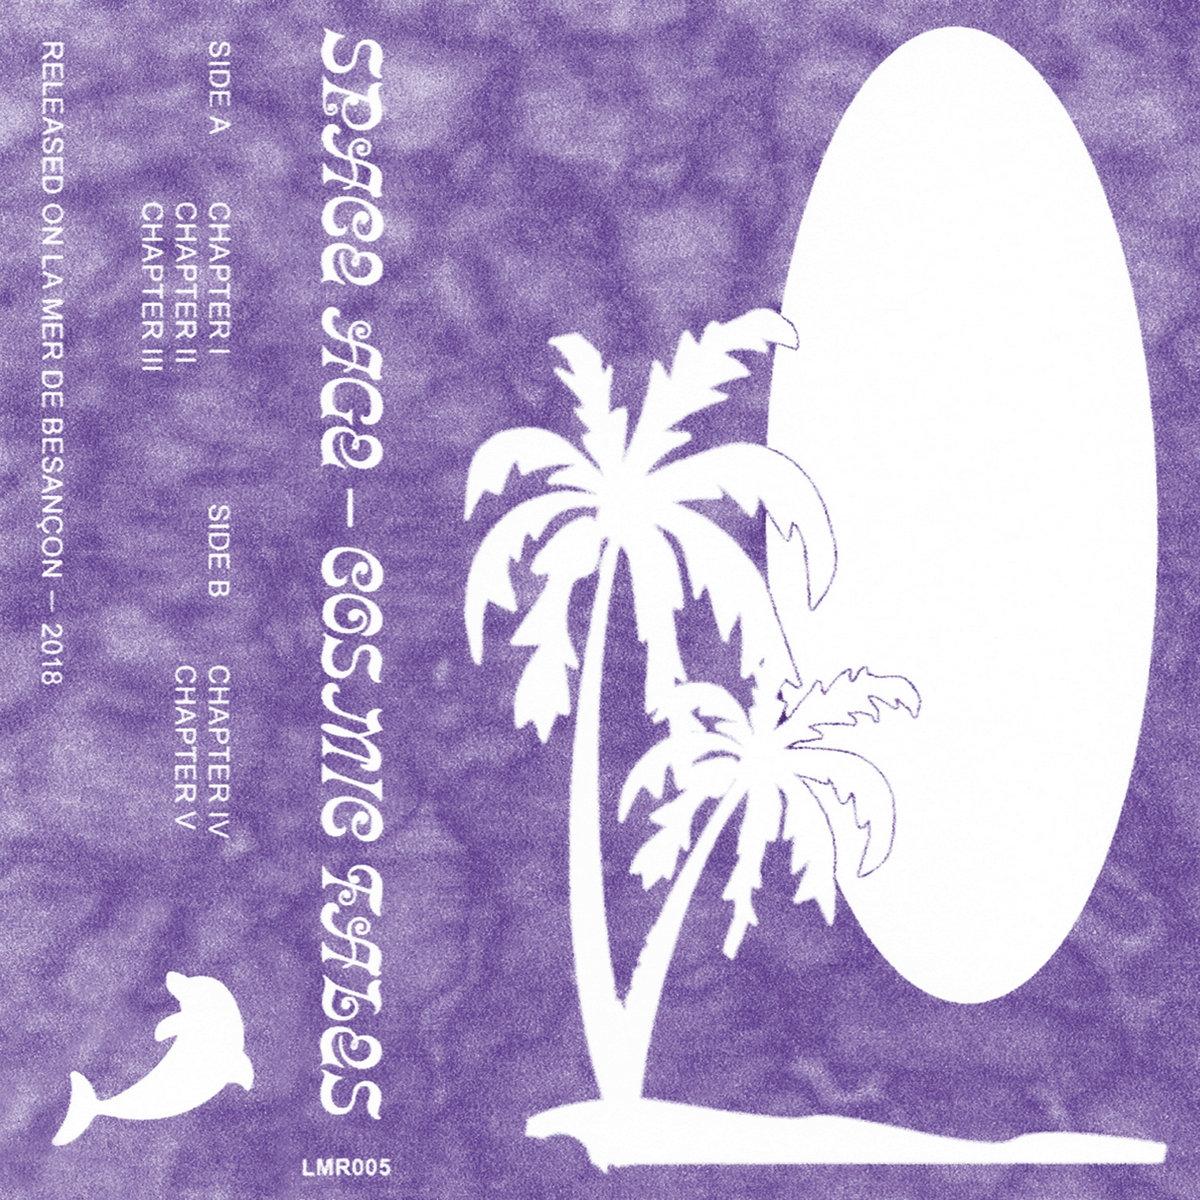 LMR005 - Cosmic Tales